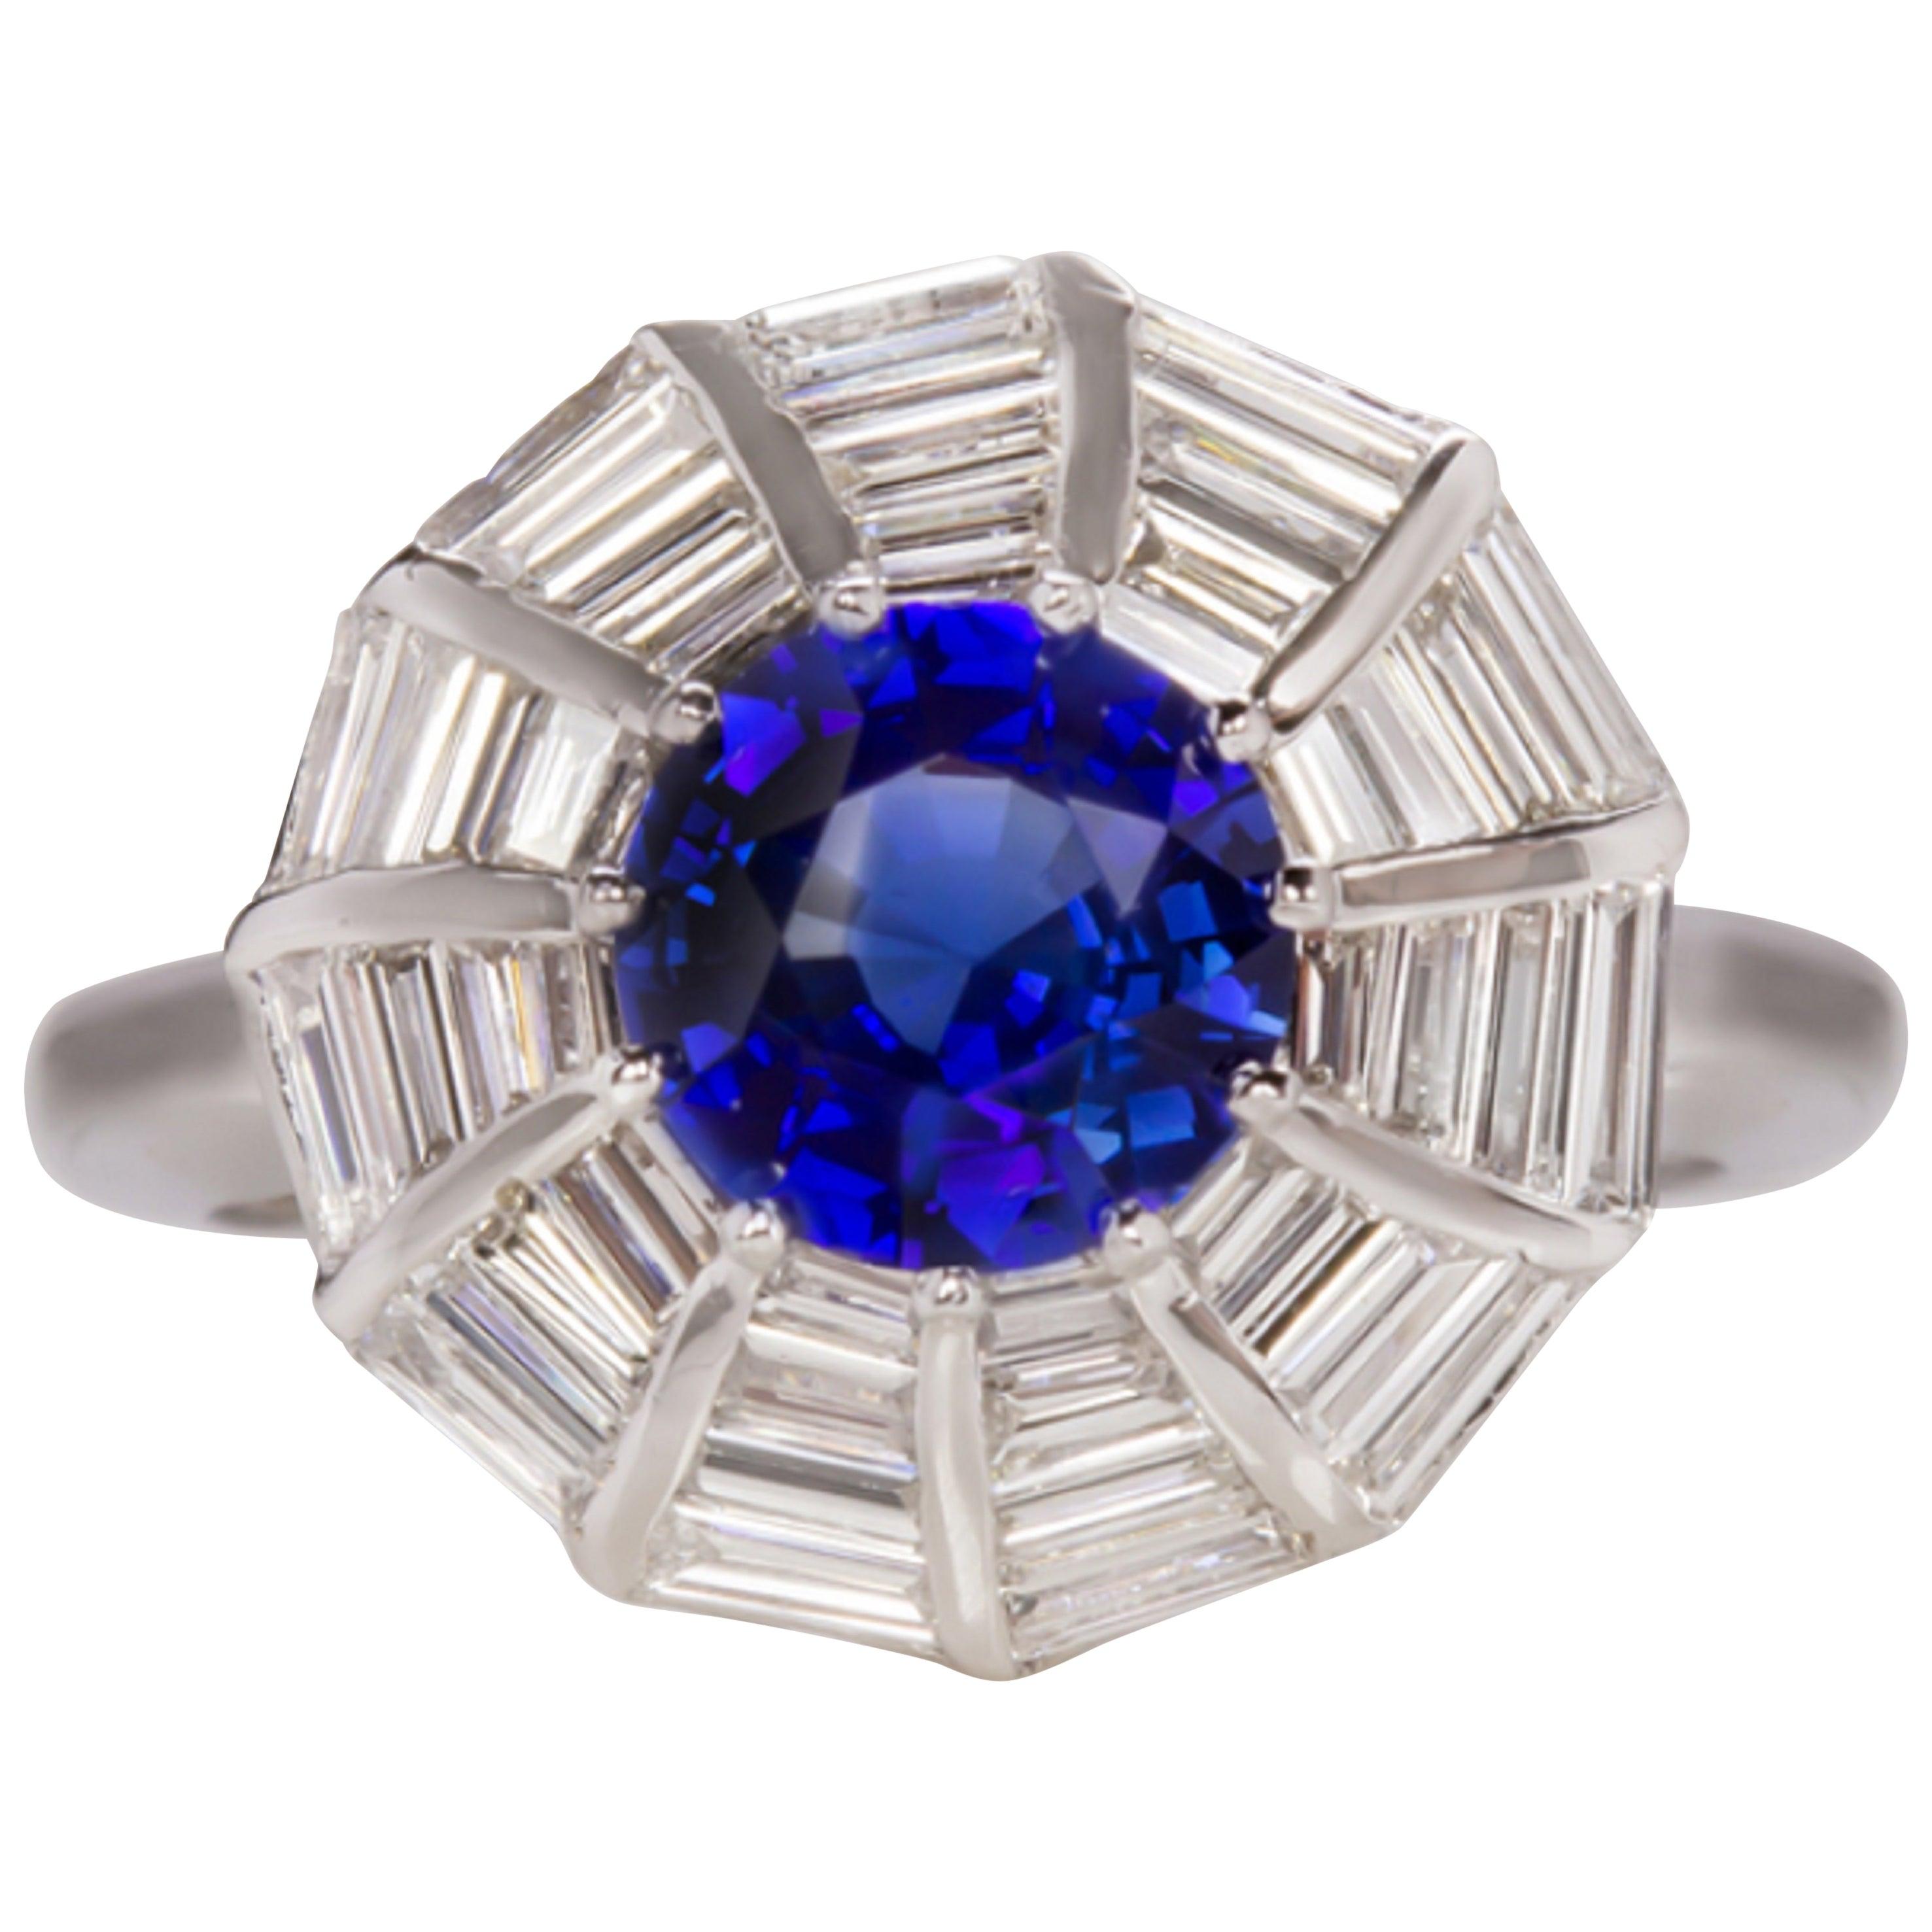 4 Carat Royal Blue Sapphire Double Vintage Revival Halo Ring 18 Karat